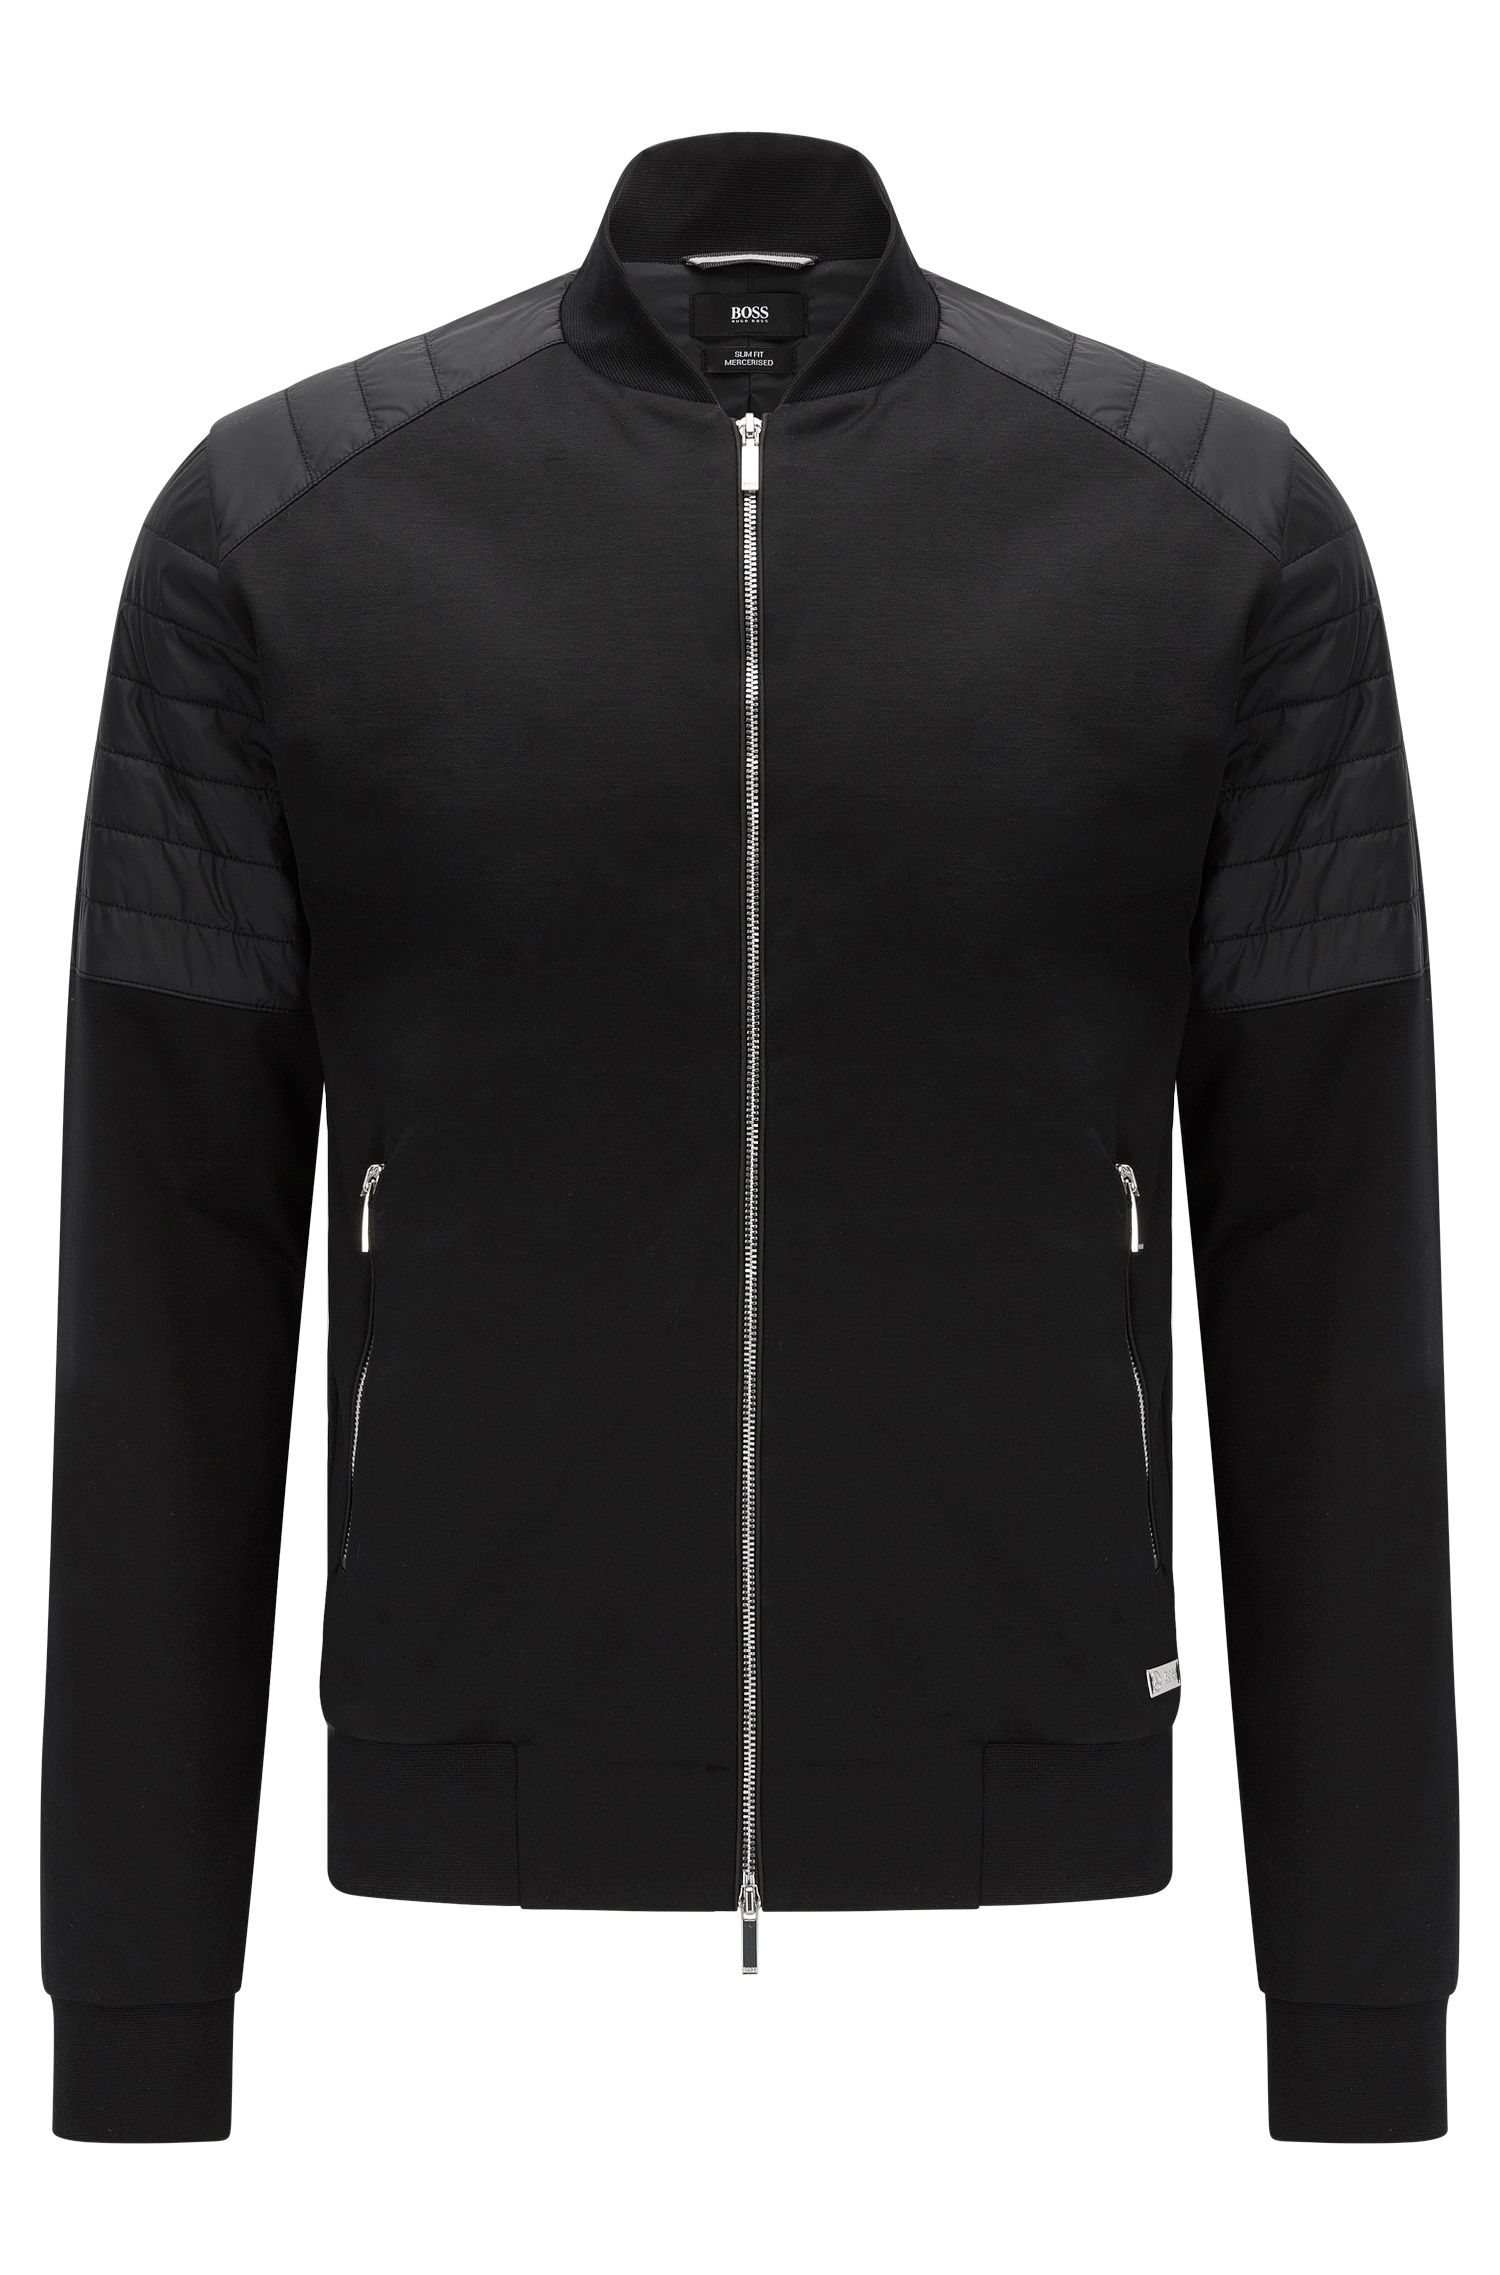 'Salea' | Mercedes-Benz Stretch Cotton Jersey Moto Jacket